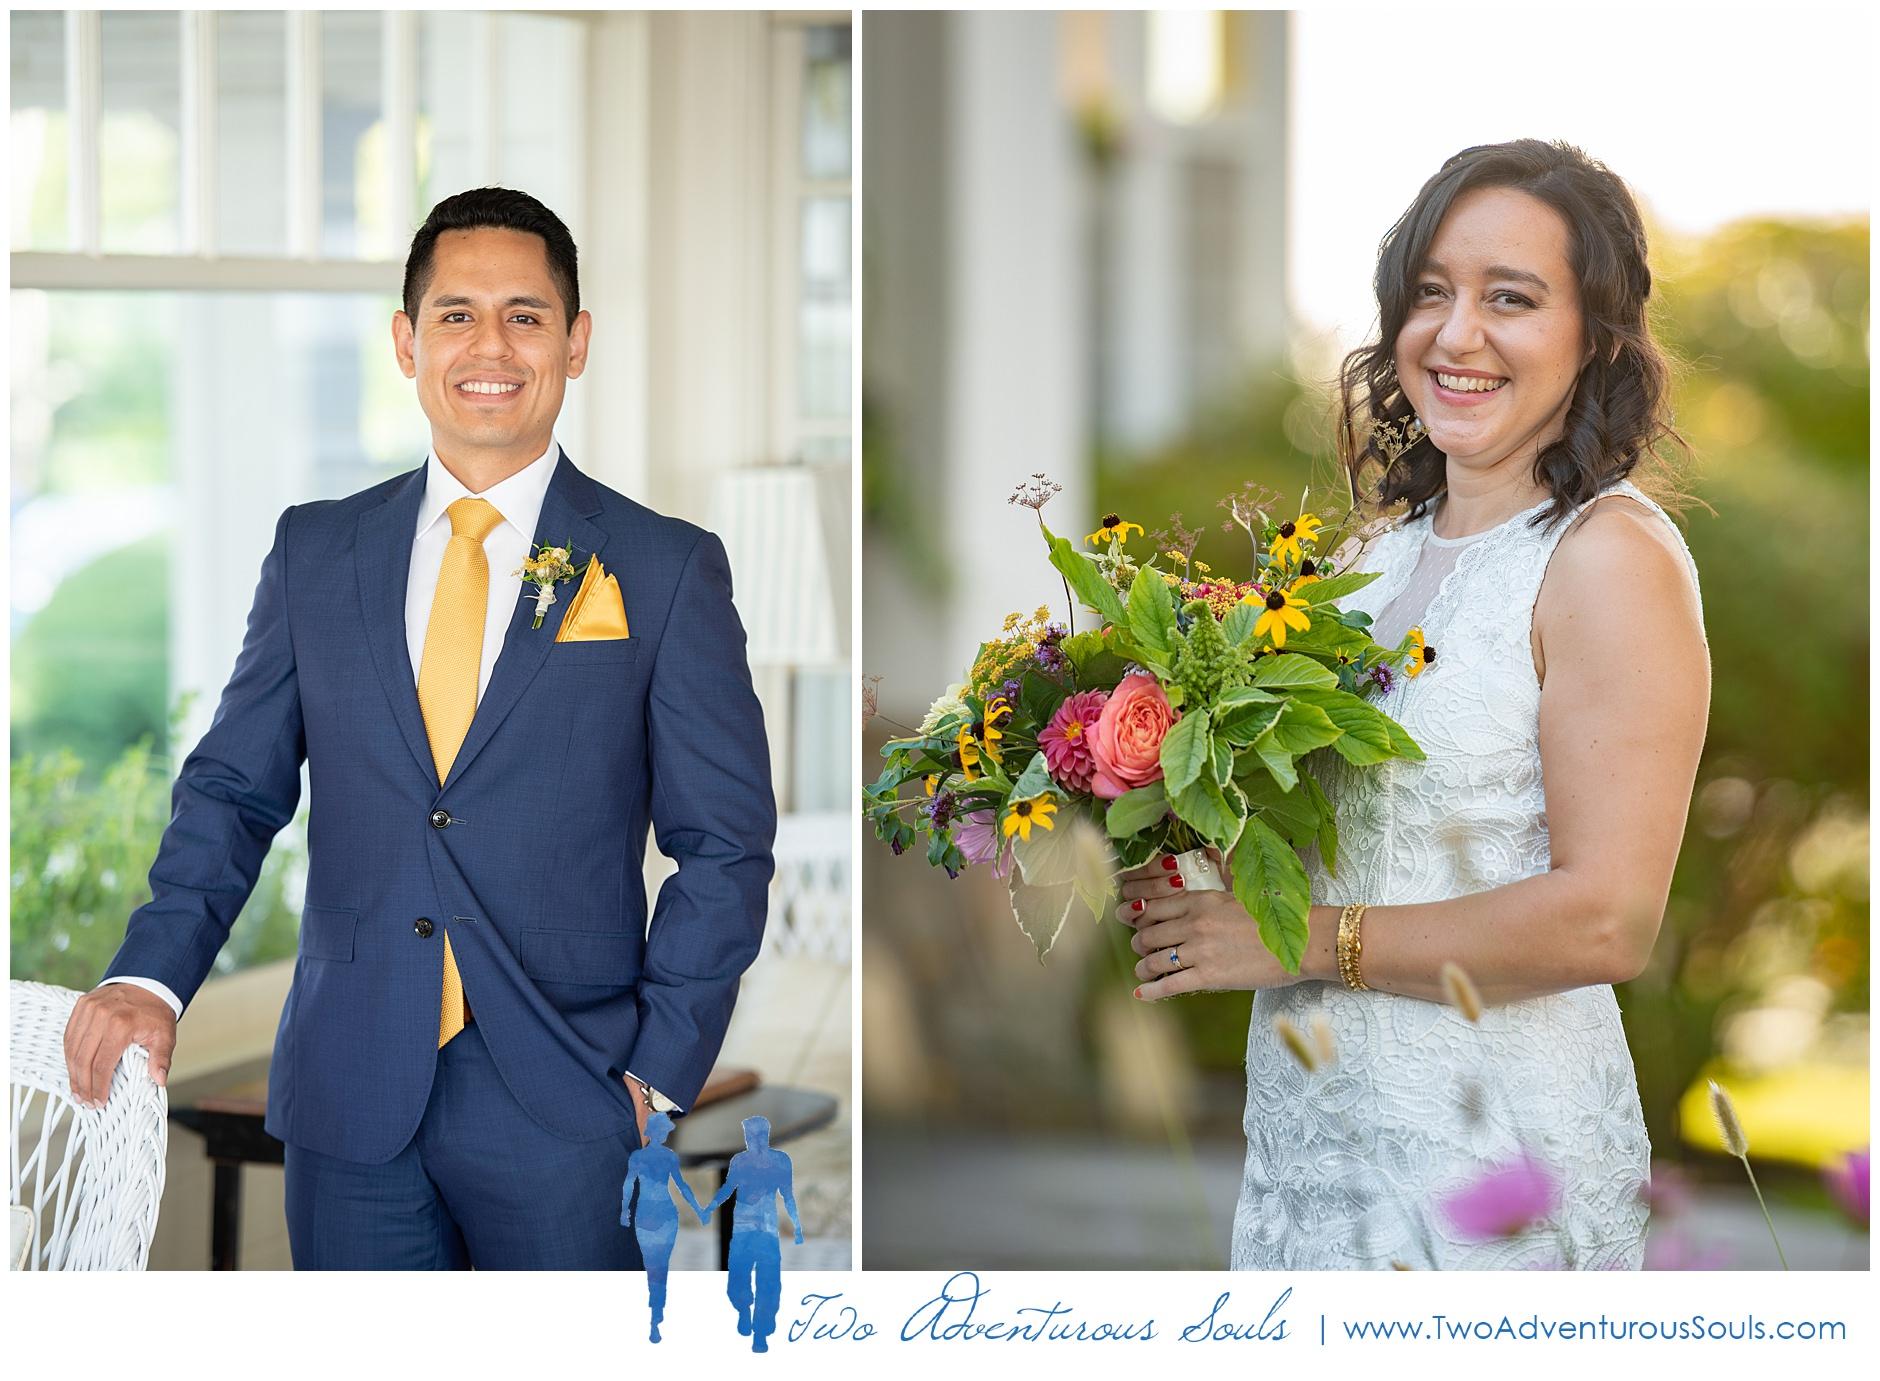 Black Point Inn Wedding Photographers, Scarborough Wedding Photographers, Two Adventurous Souls- 083019_0001.jpg